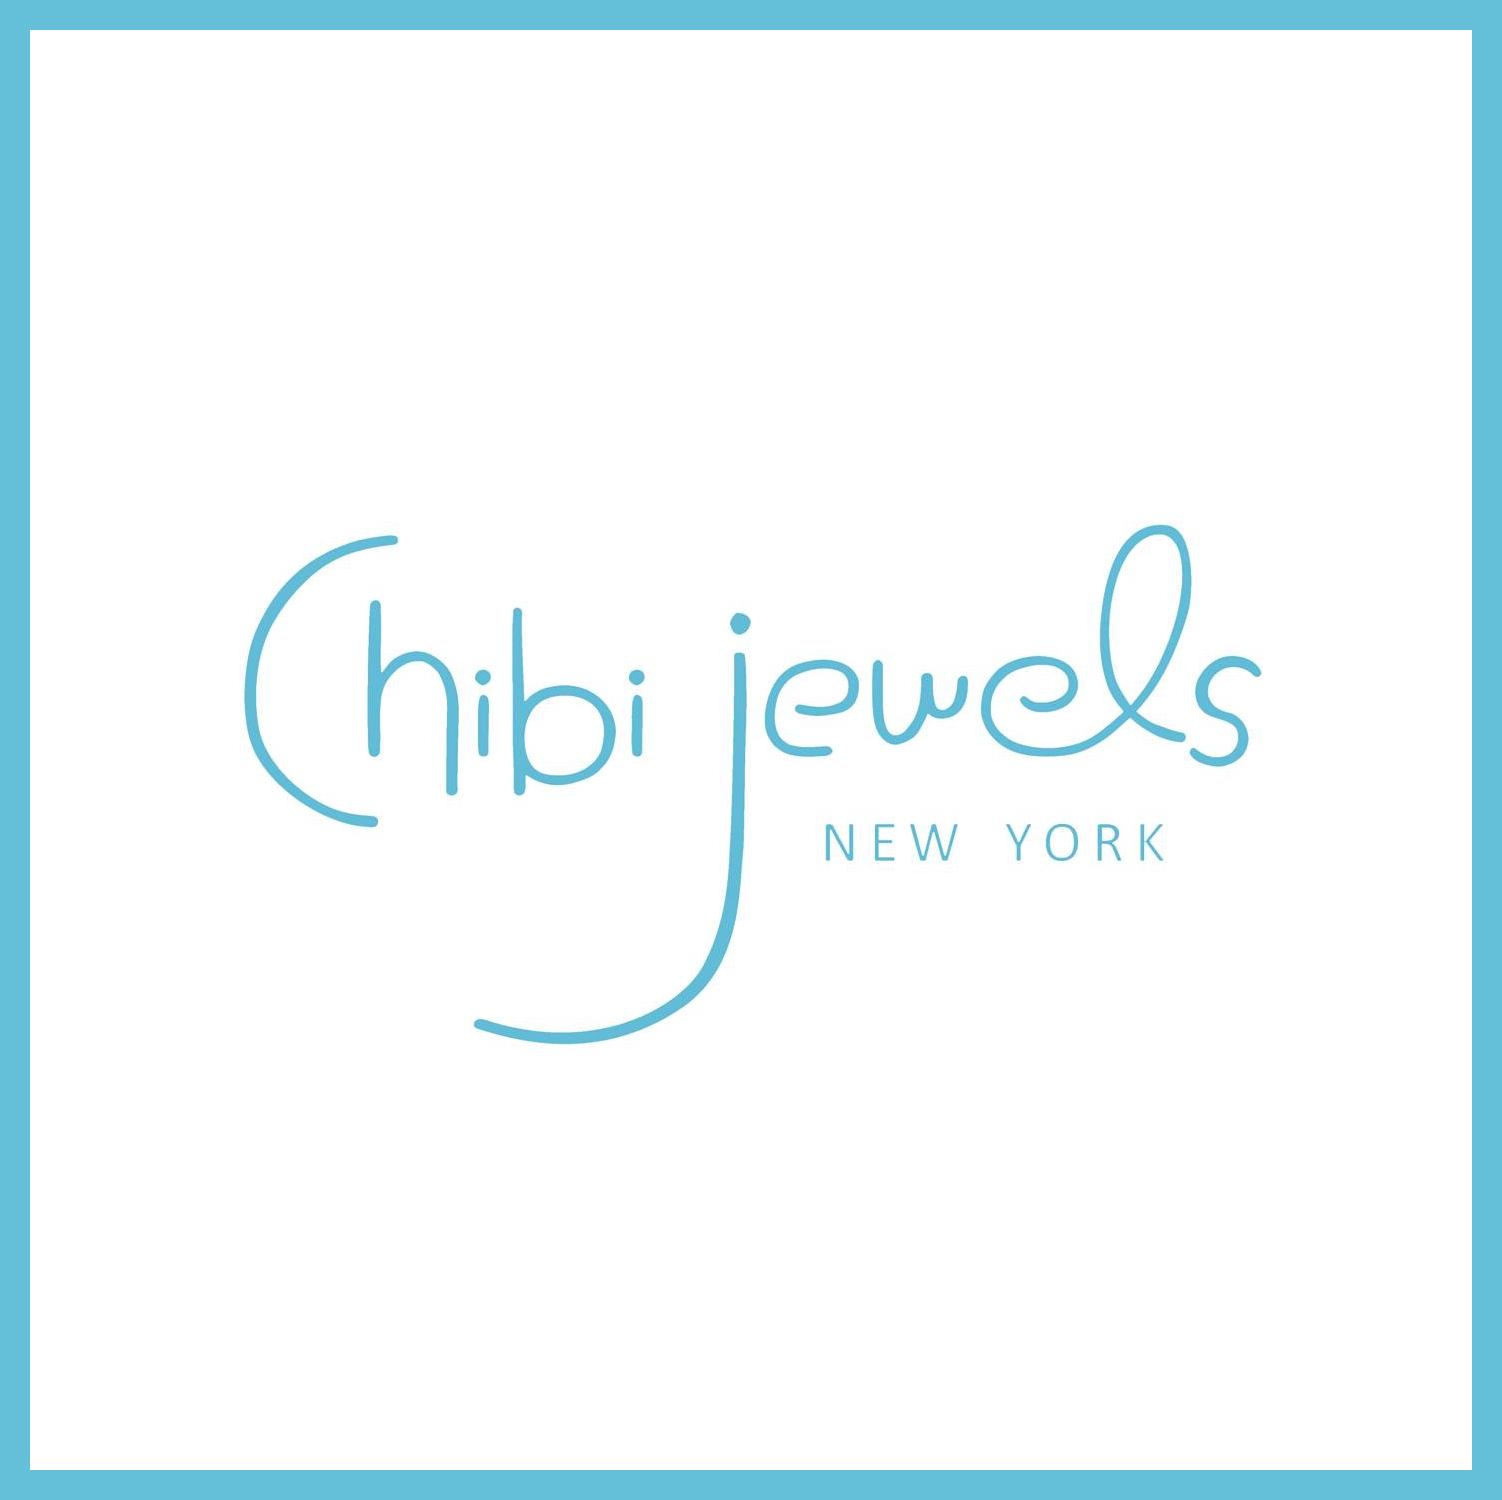 chibijewels logo